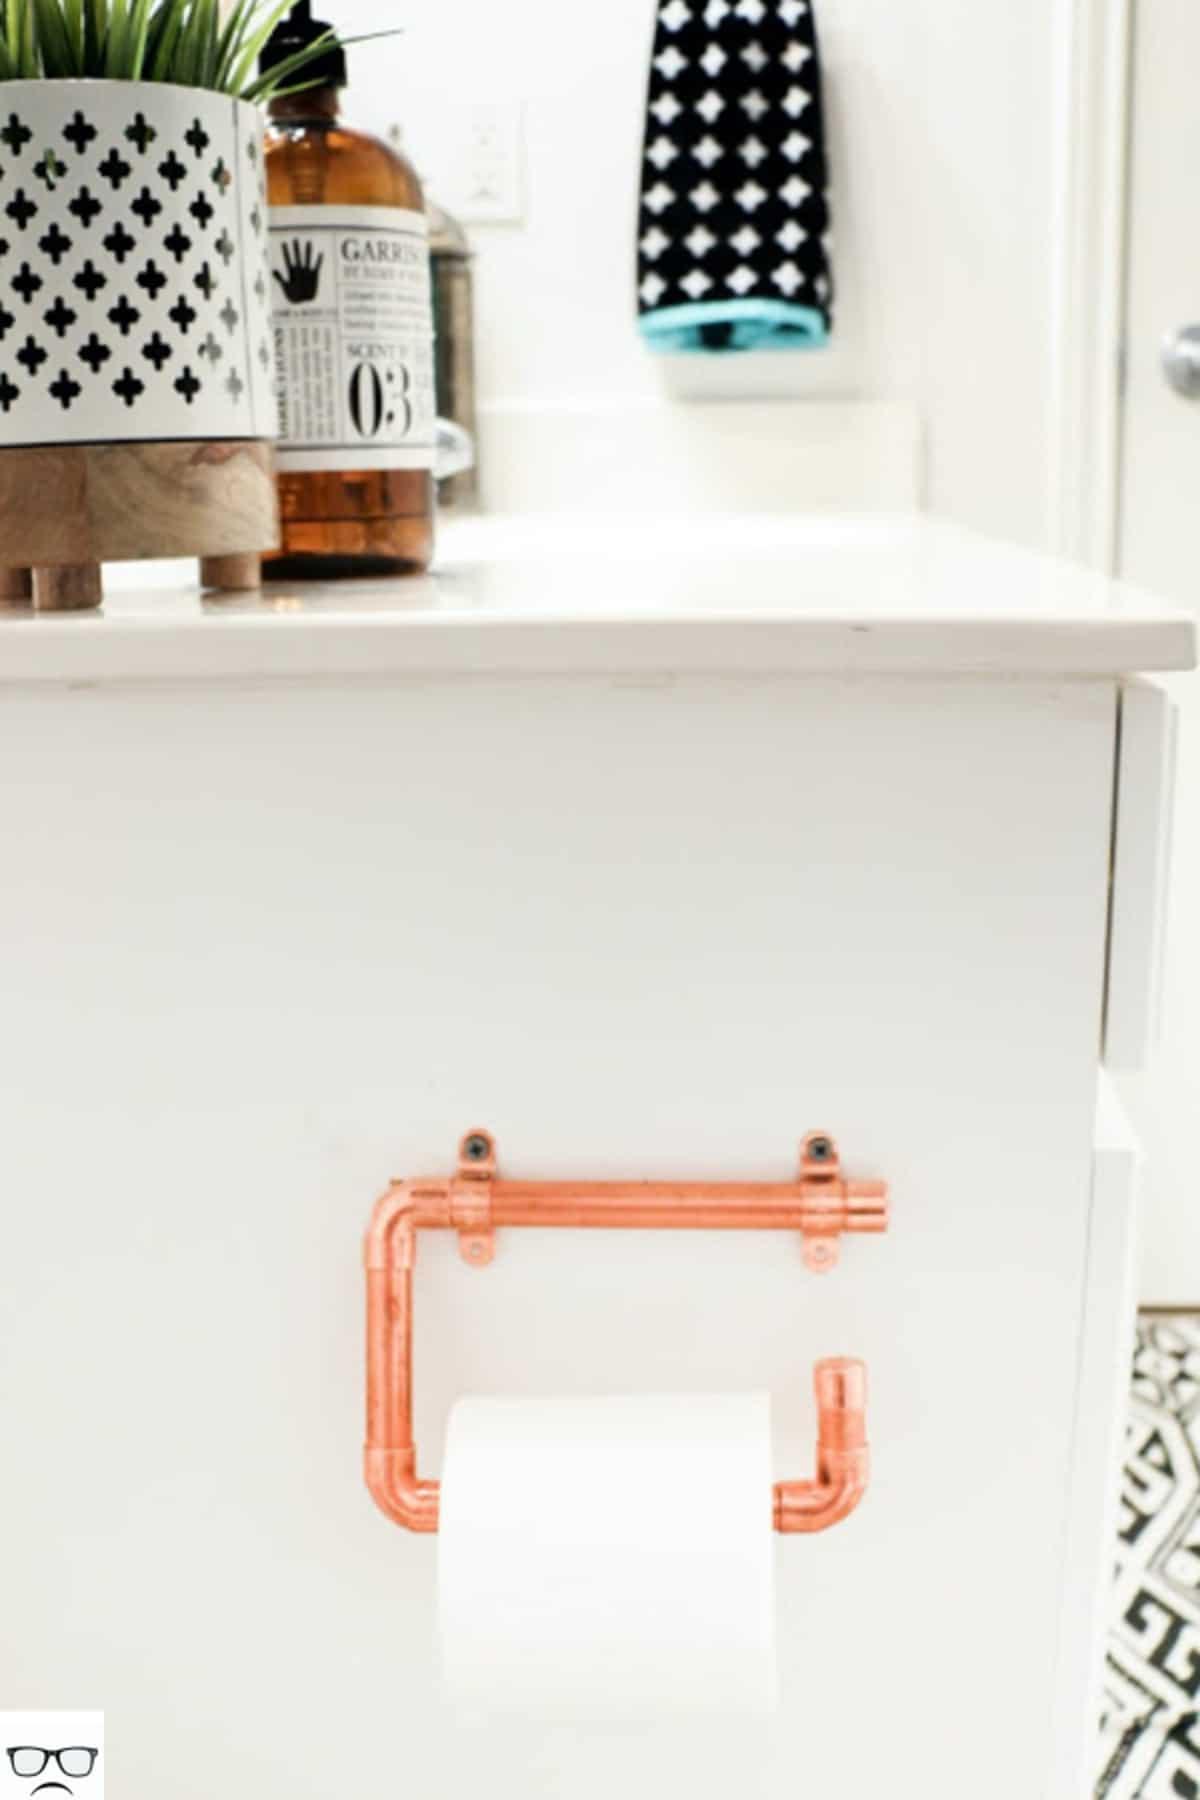 Copper Pipe Paper Holder